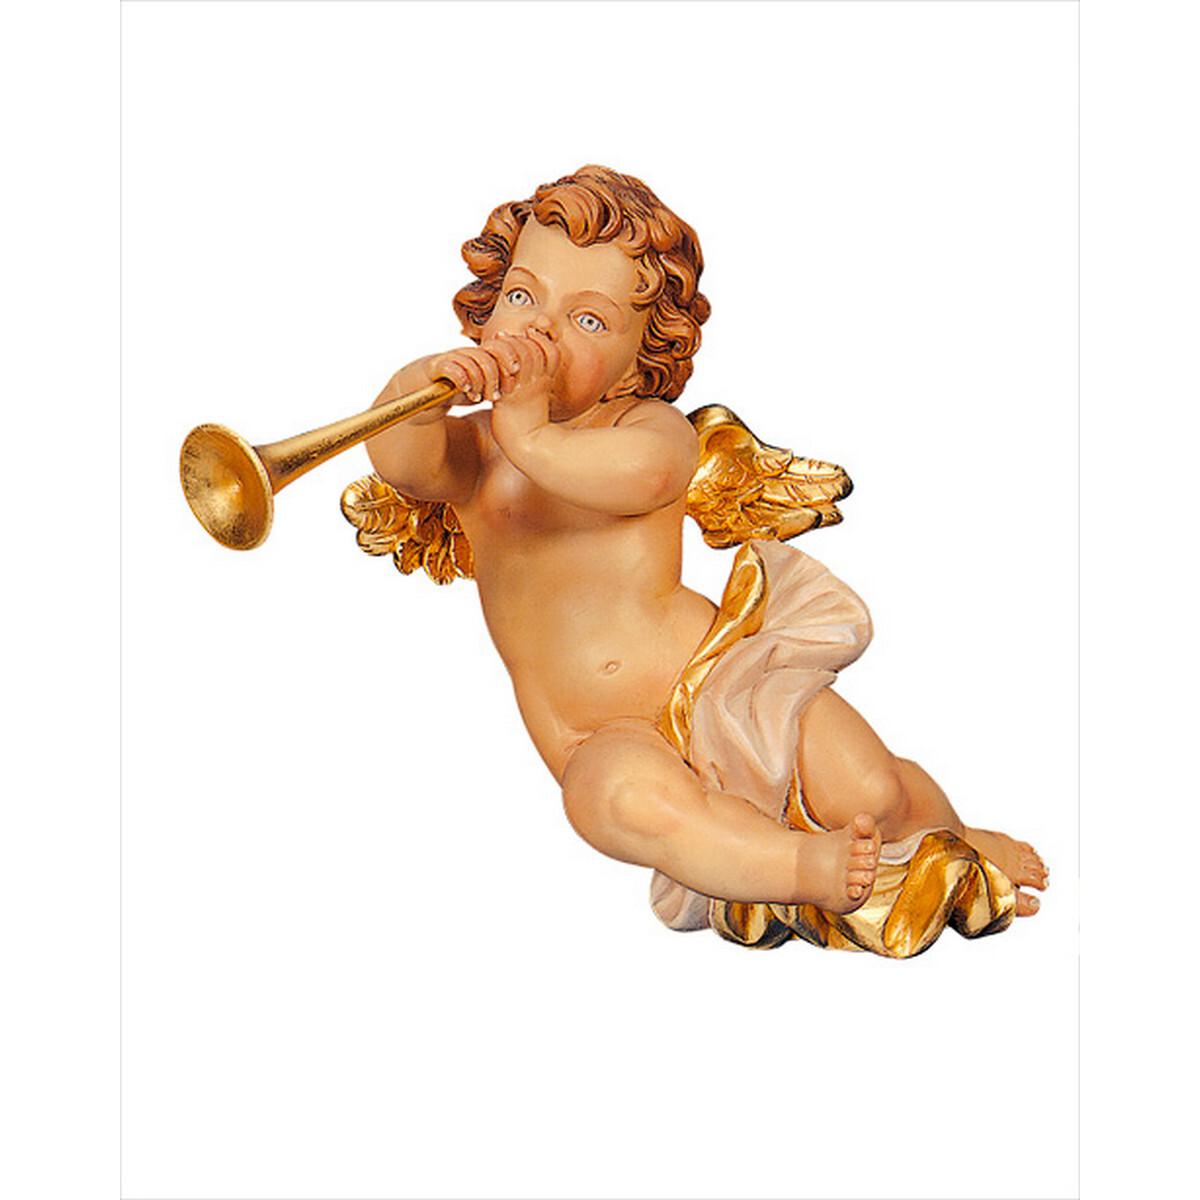 engel mit trompete antik mit echtgoldauflage oa 56. Black Bedroom Furniture Sets. Home Design Ideas